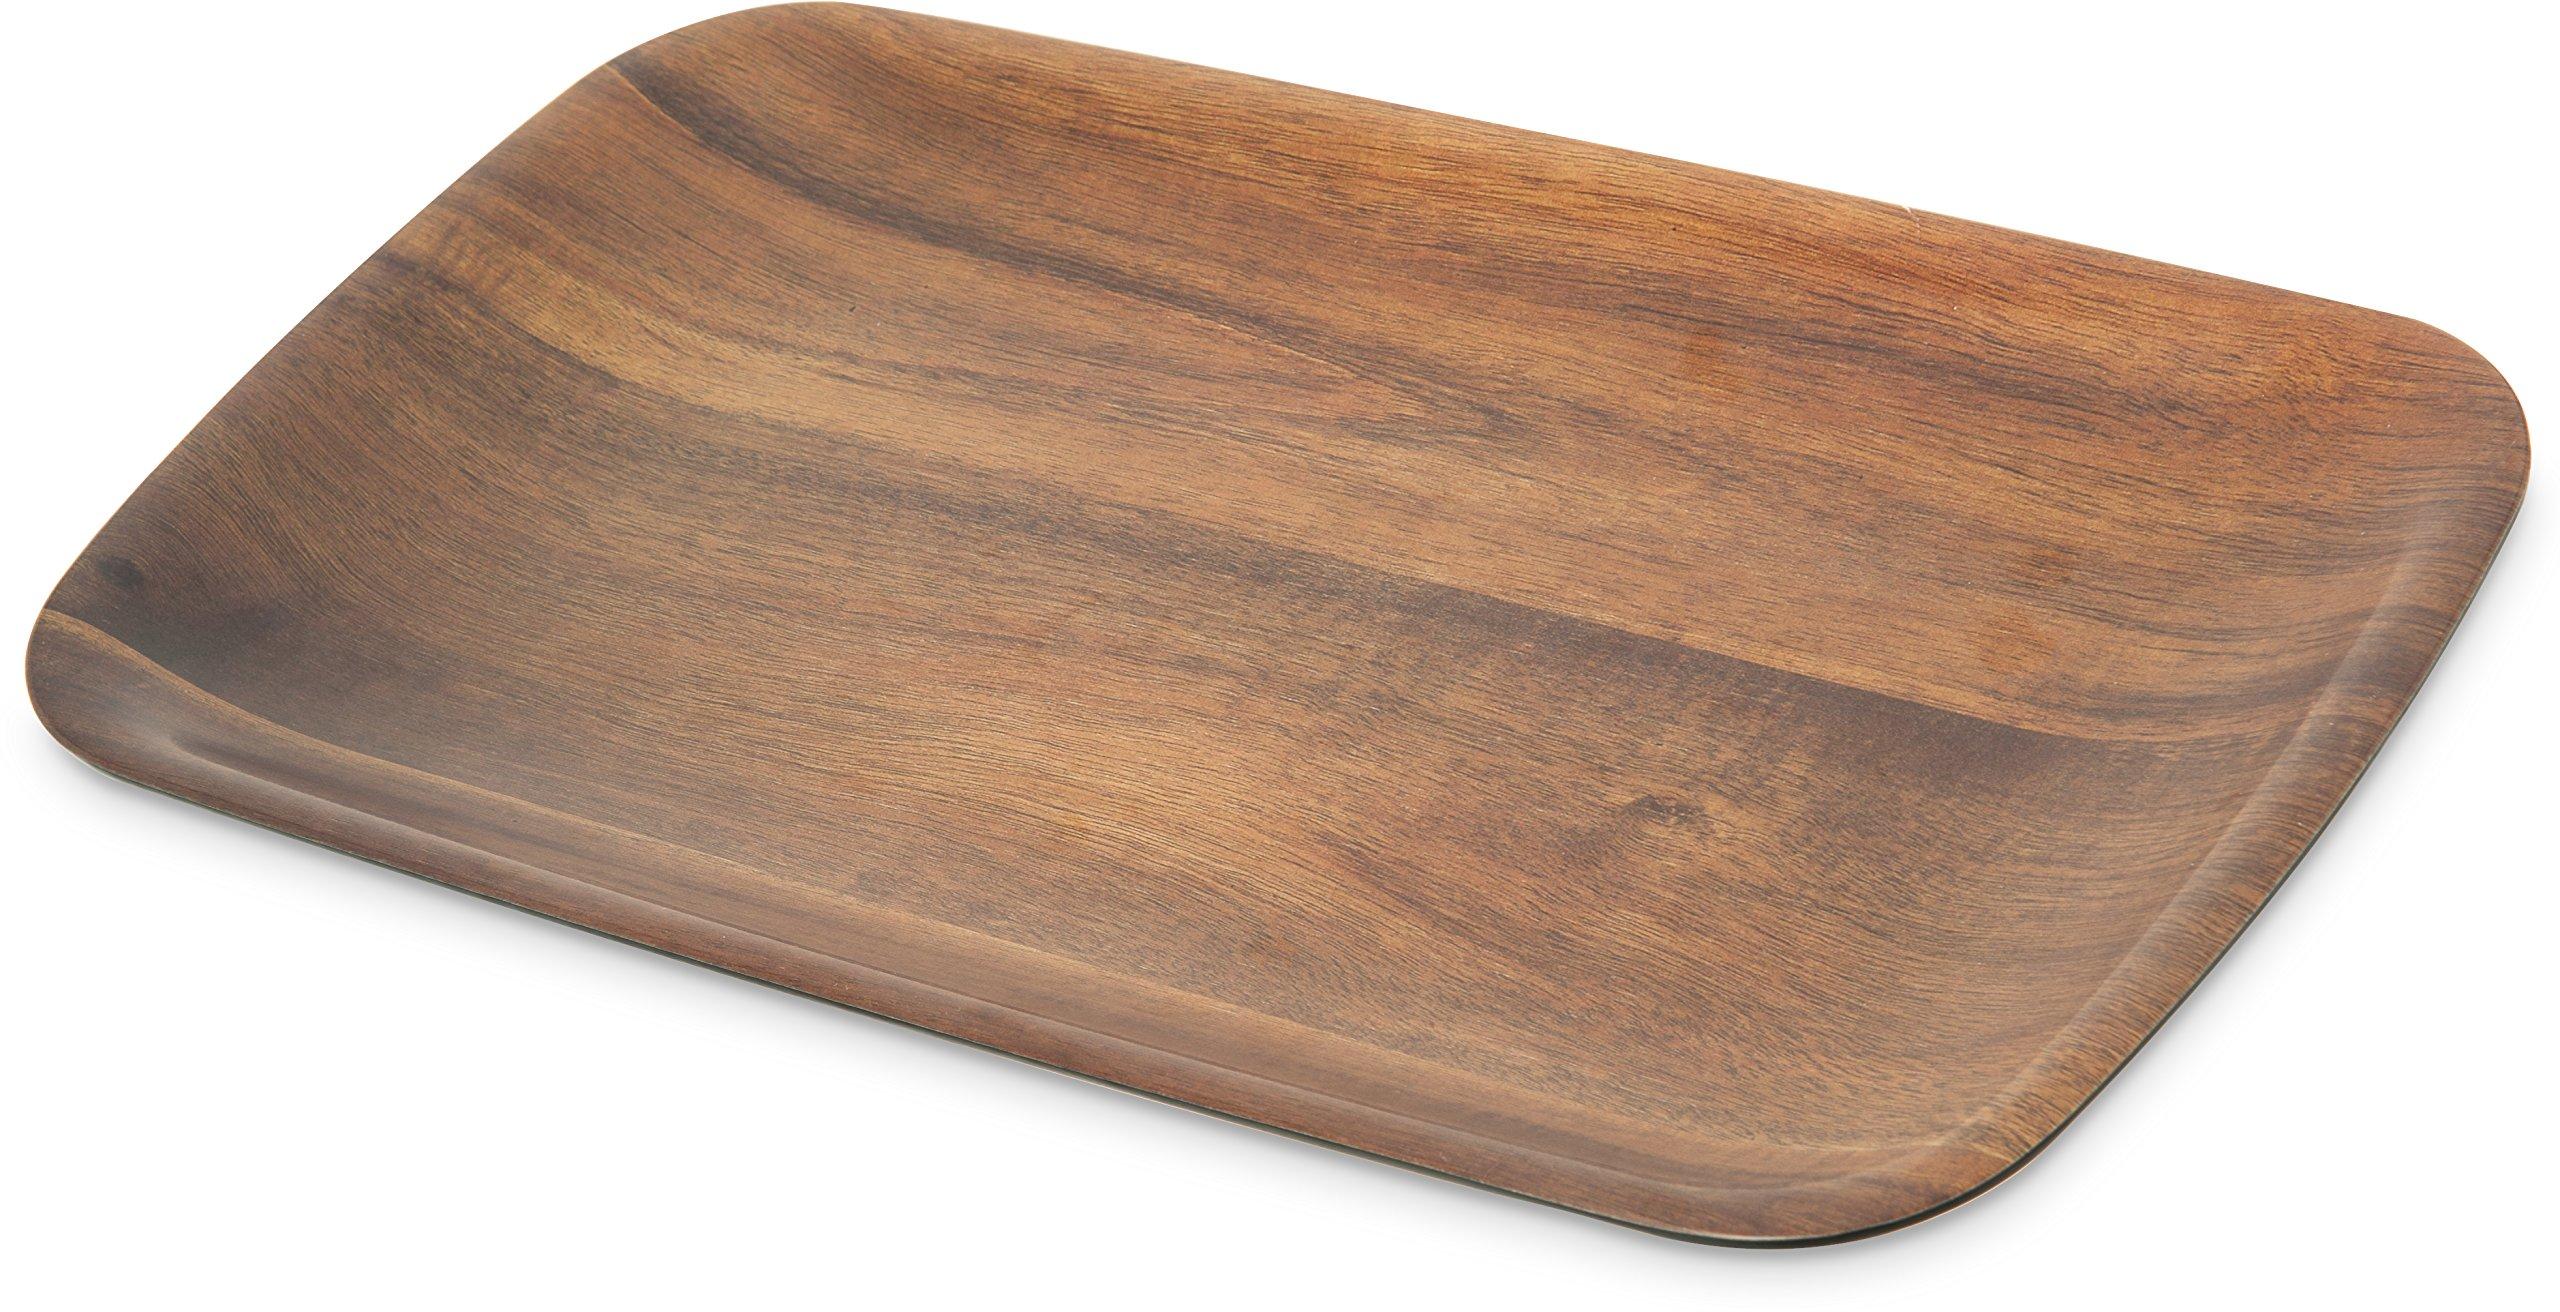 Carlisle EAG0569 Epicure Melamine Acacia Wood Grain Rectangle Tray, Plastic, 14'' x 8'', Woodgrain (Pack of 12)